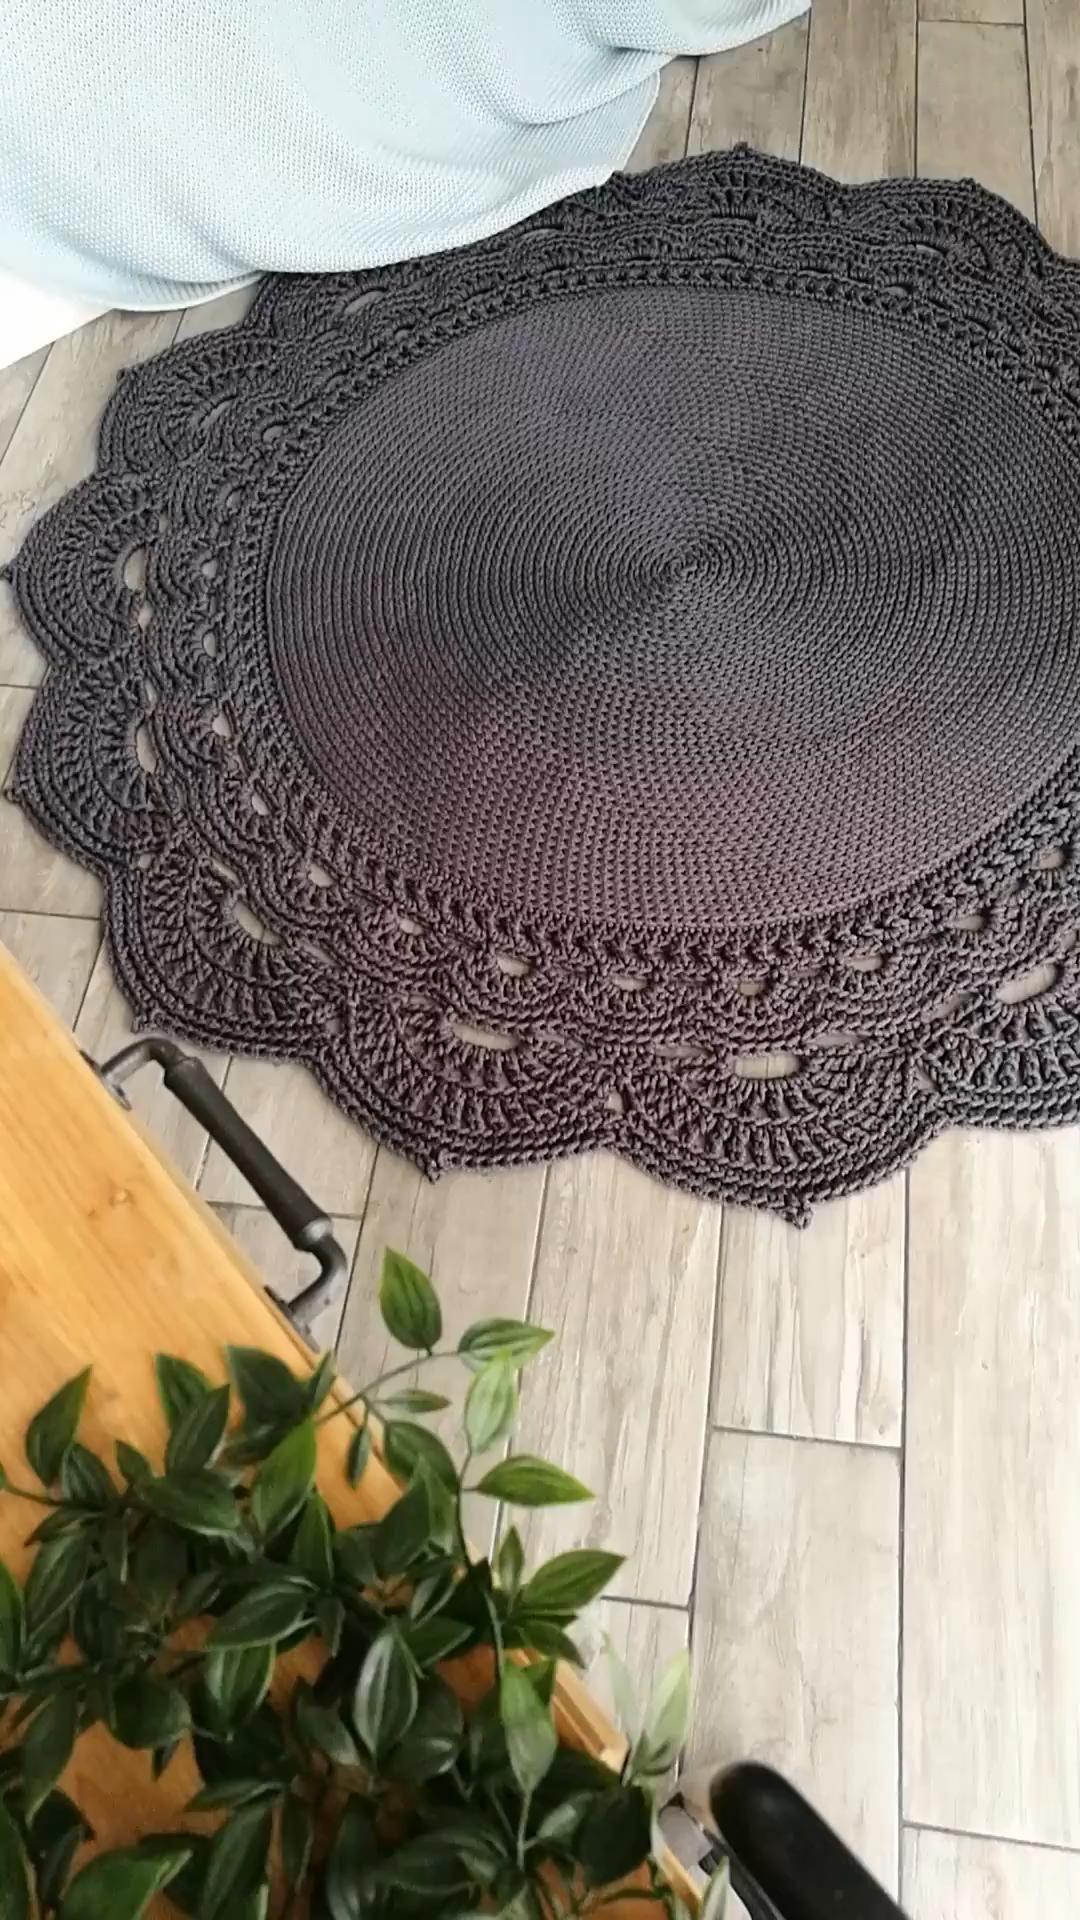 Craft room decor. Crochet rug